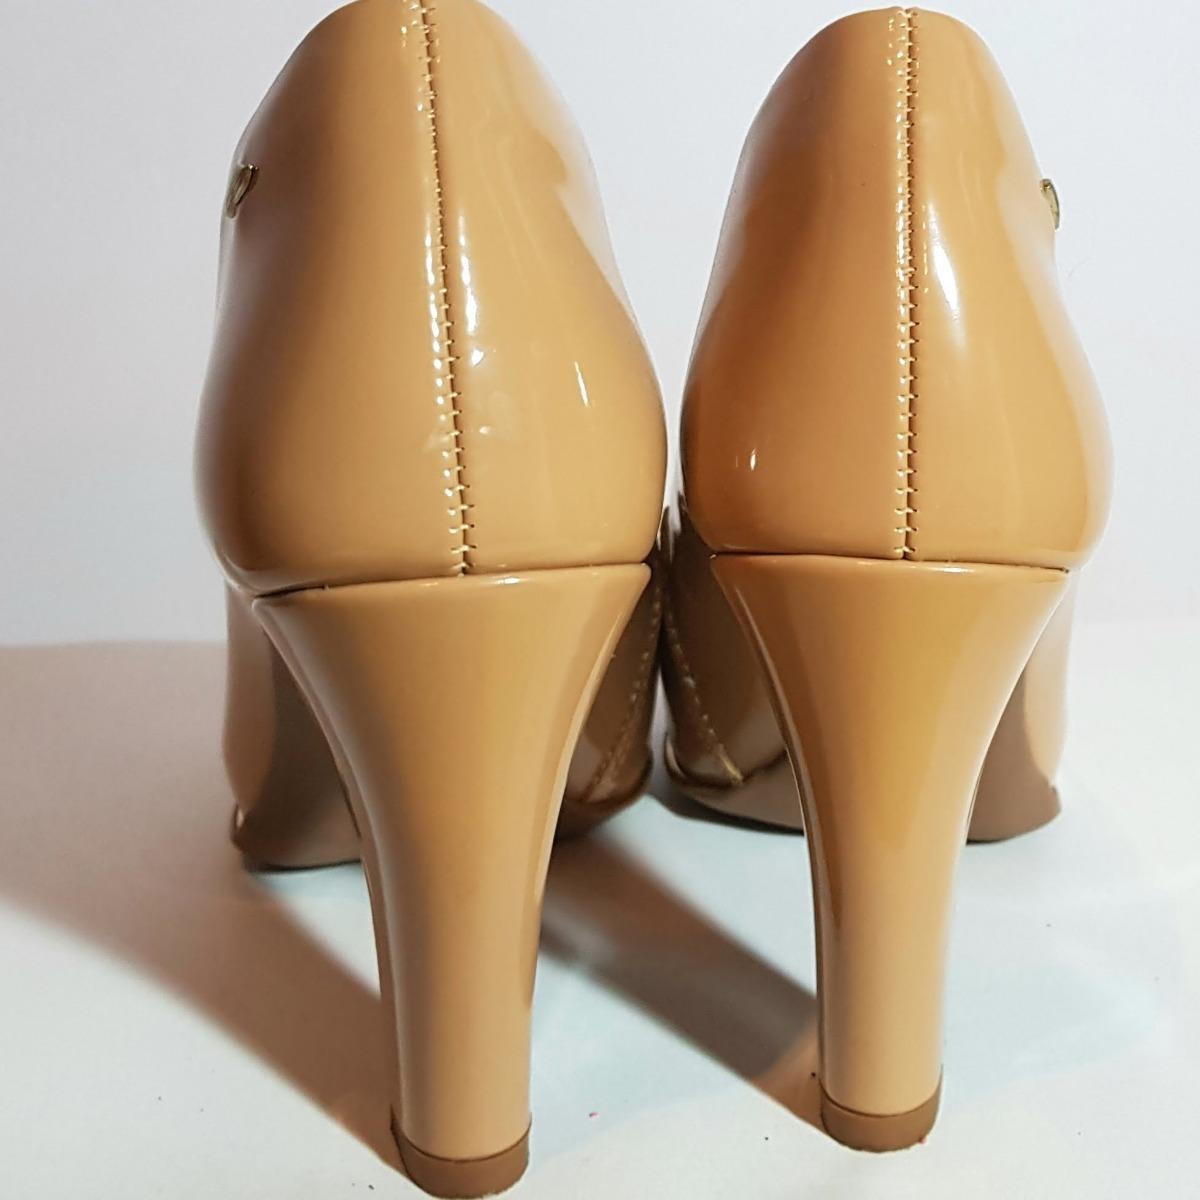 b4df2dbf9c Sapato Feminino Dakota  nude Verniz  - Meia Pata - Confort - R  142 ...